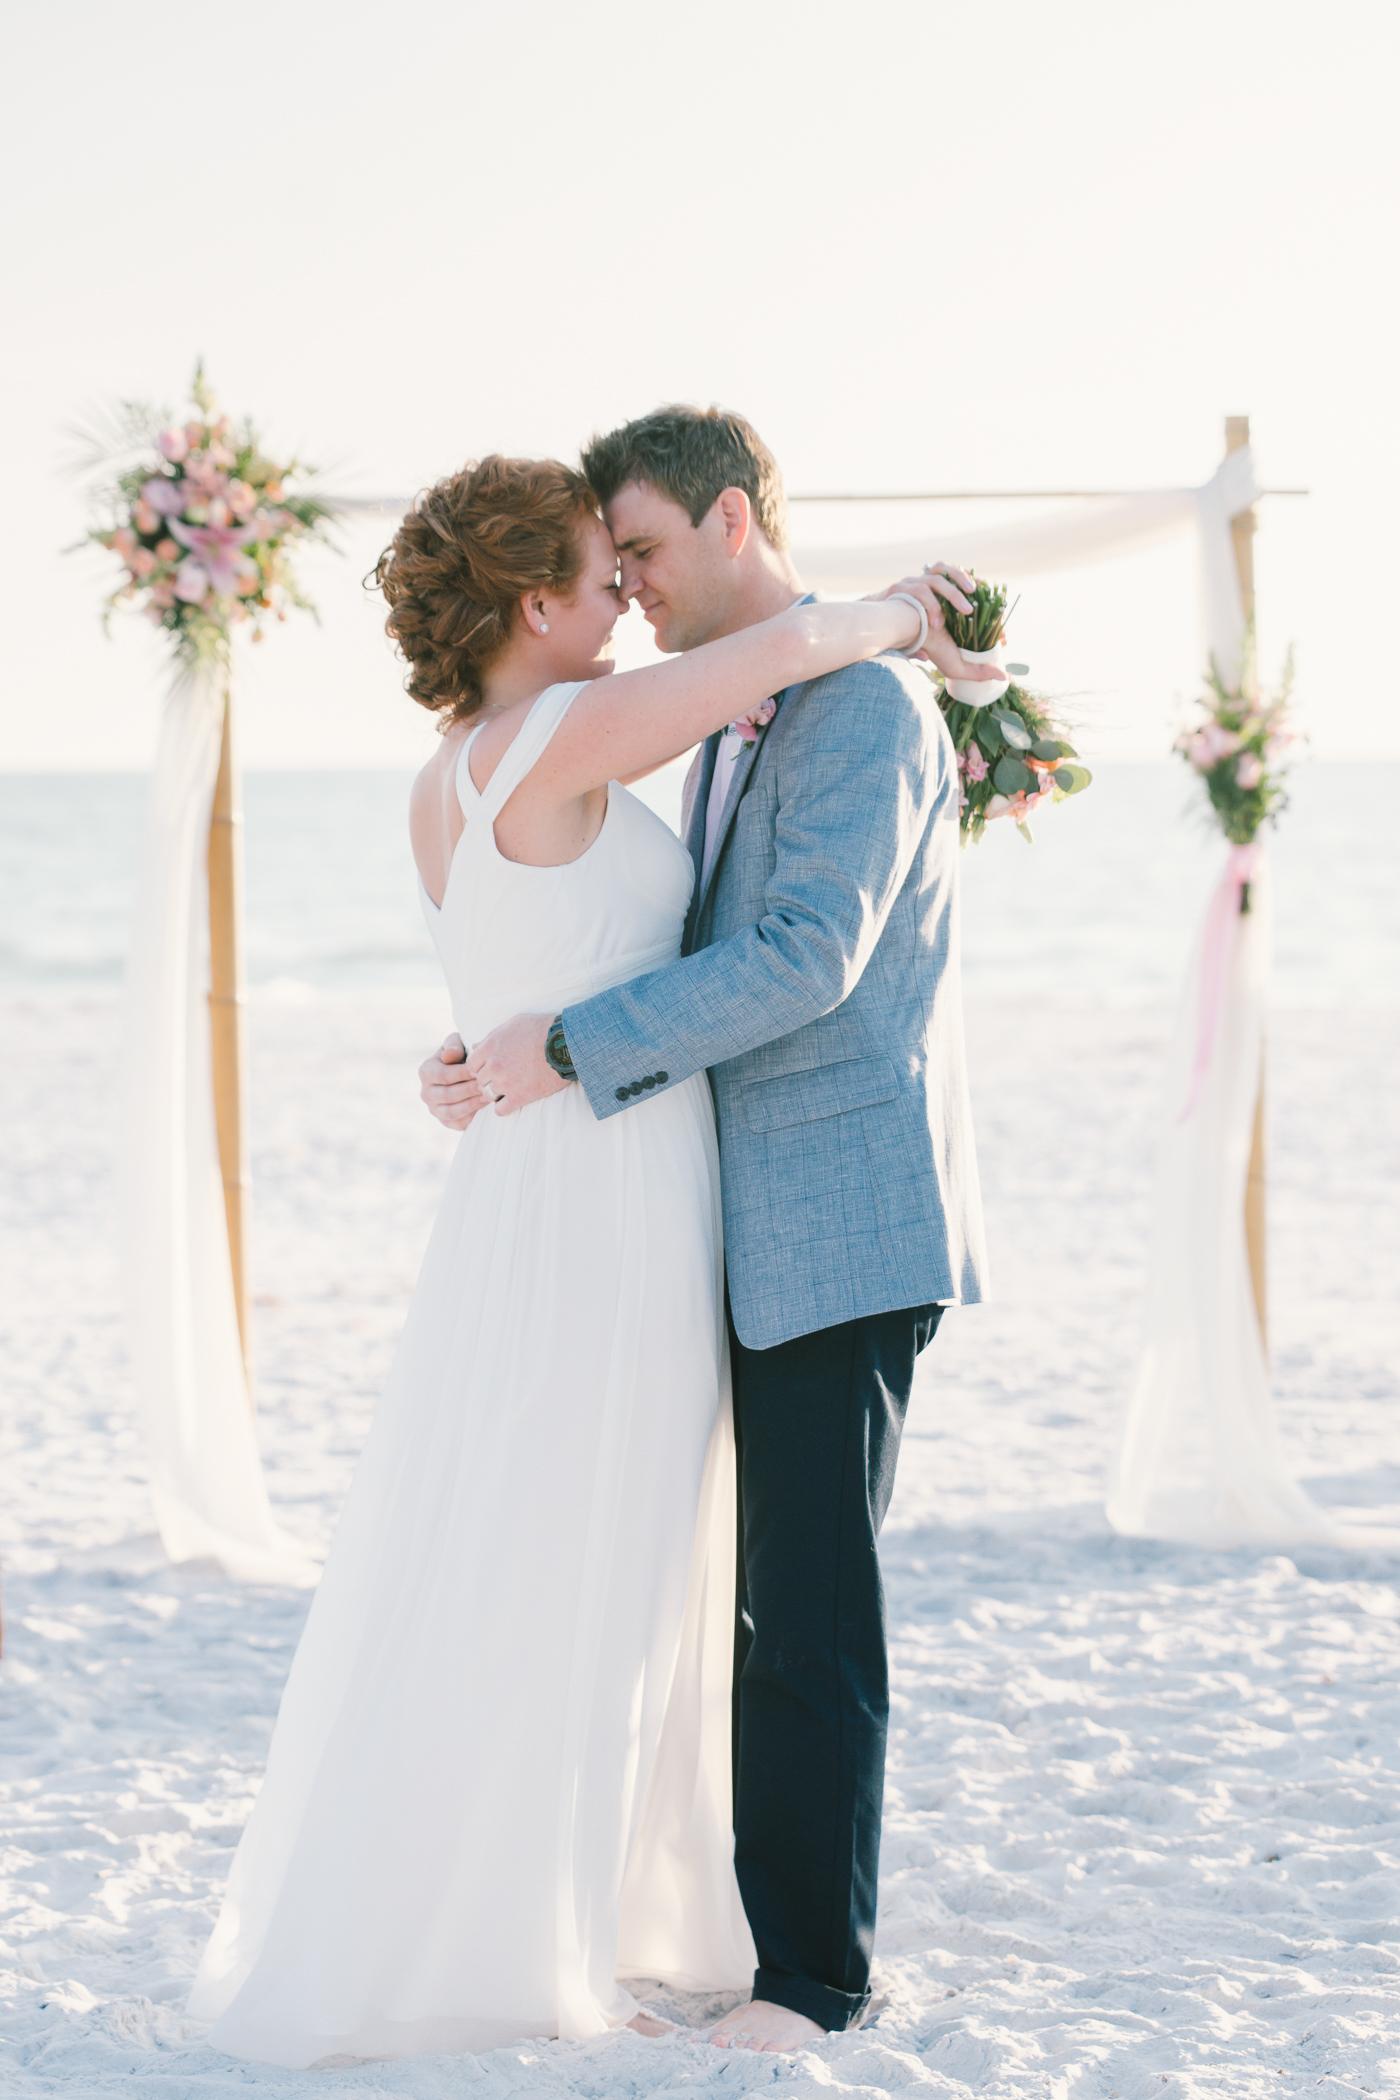 Tide-the-knot-beach-weddings, bride-and-groom-dance